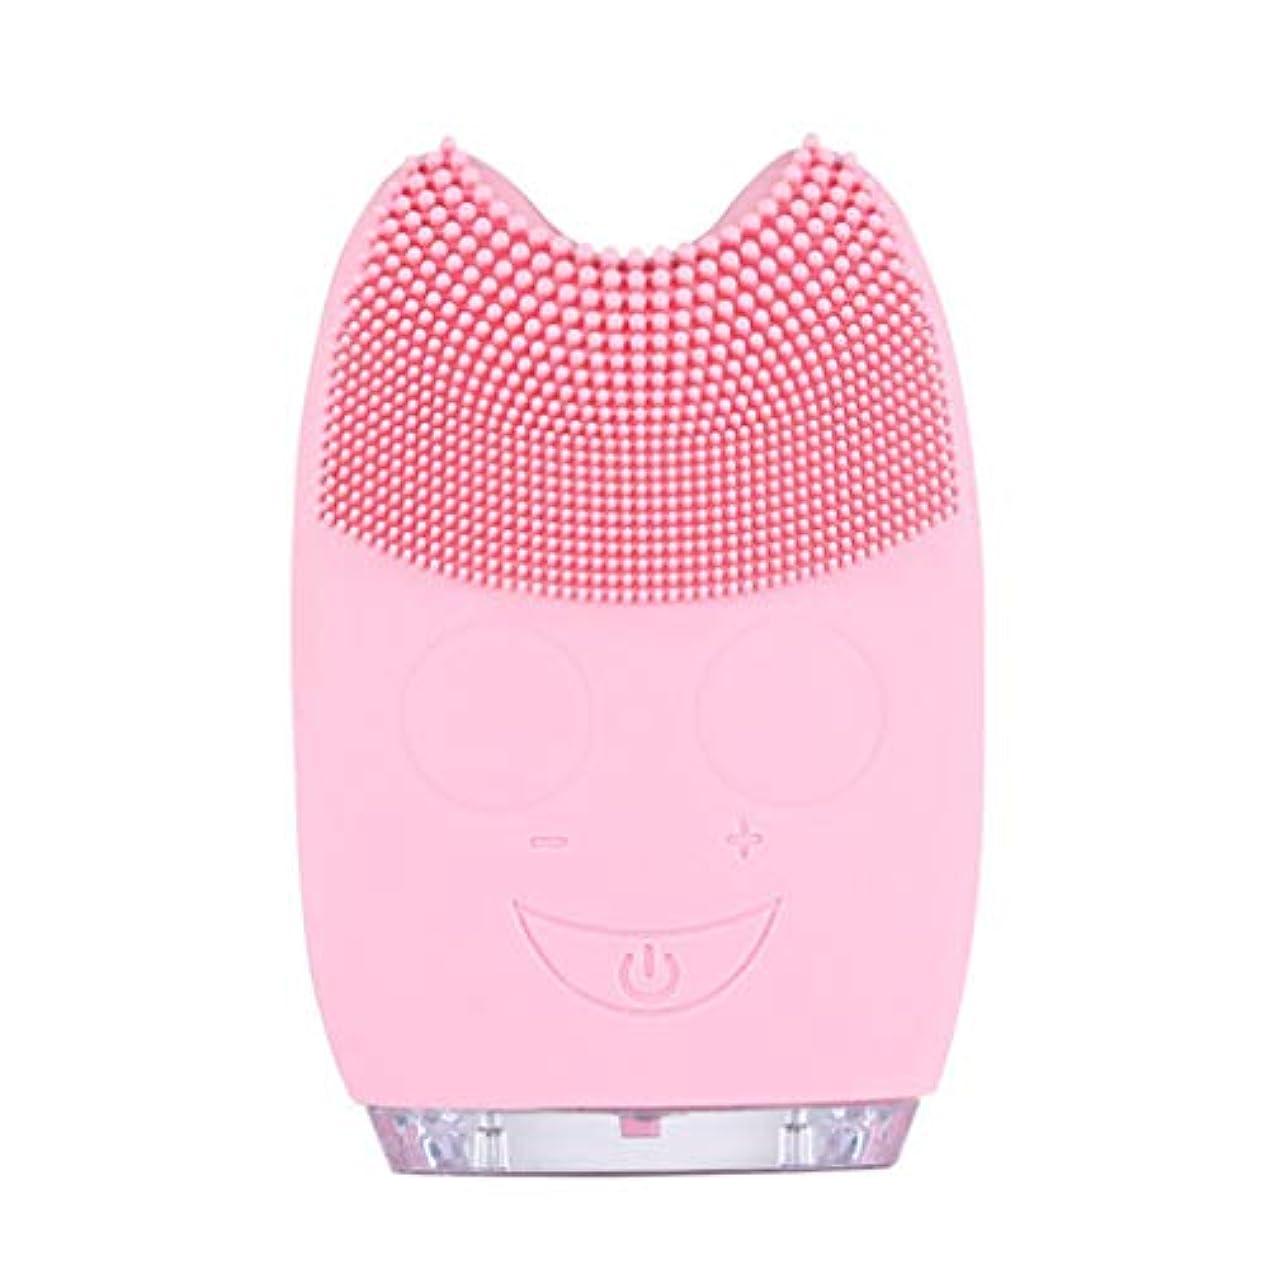 Qi フェイシャルクレンザーブラシ、防水ミニ電動マッサージマシンシリコンフェイシャルクレンジングデバイスツール GQ (色 : Pink)